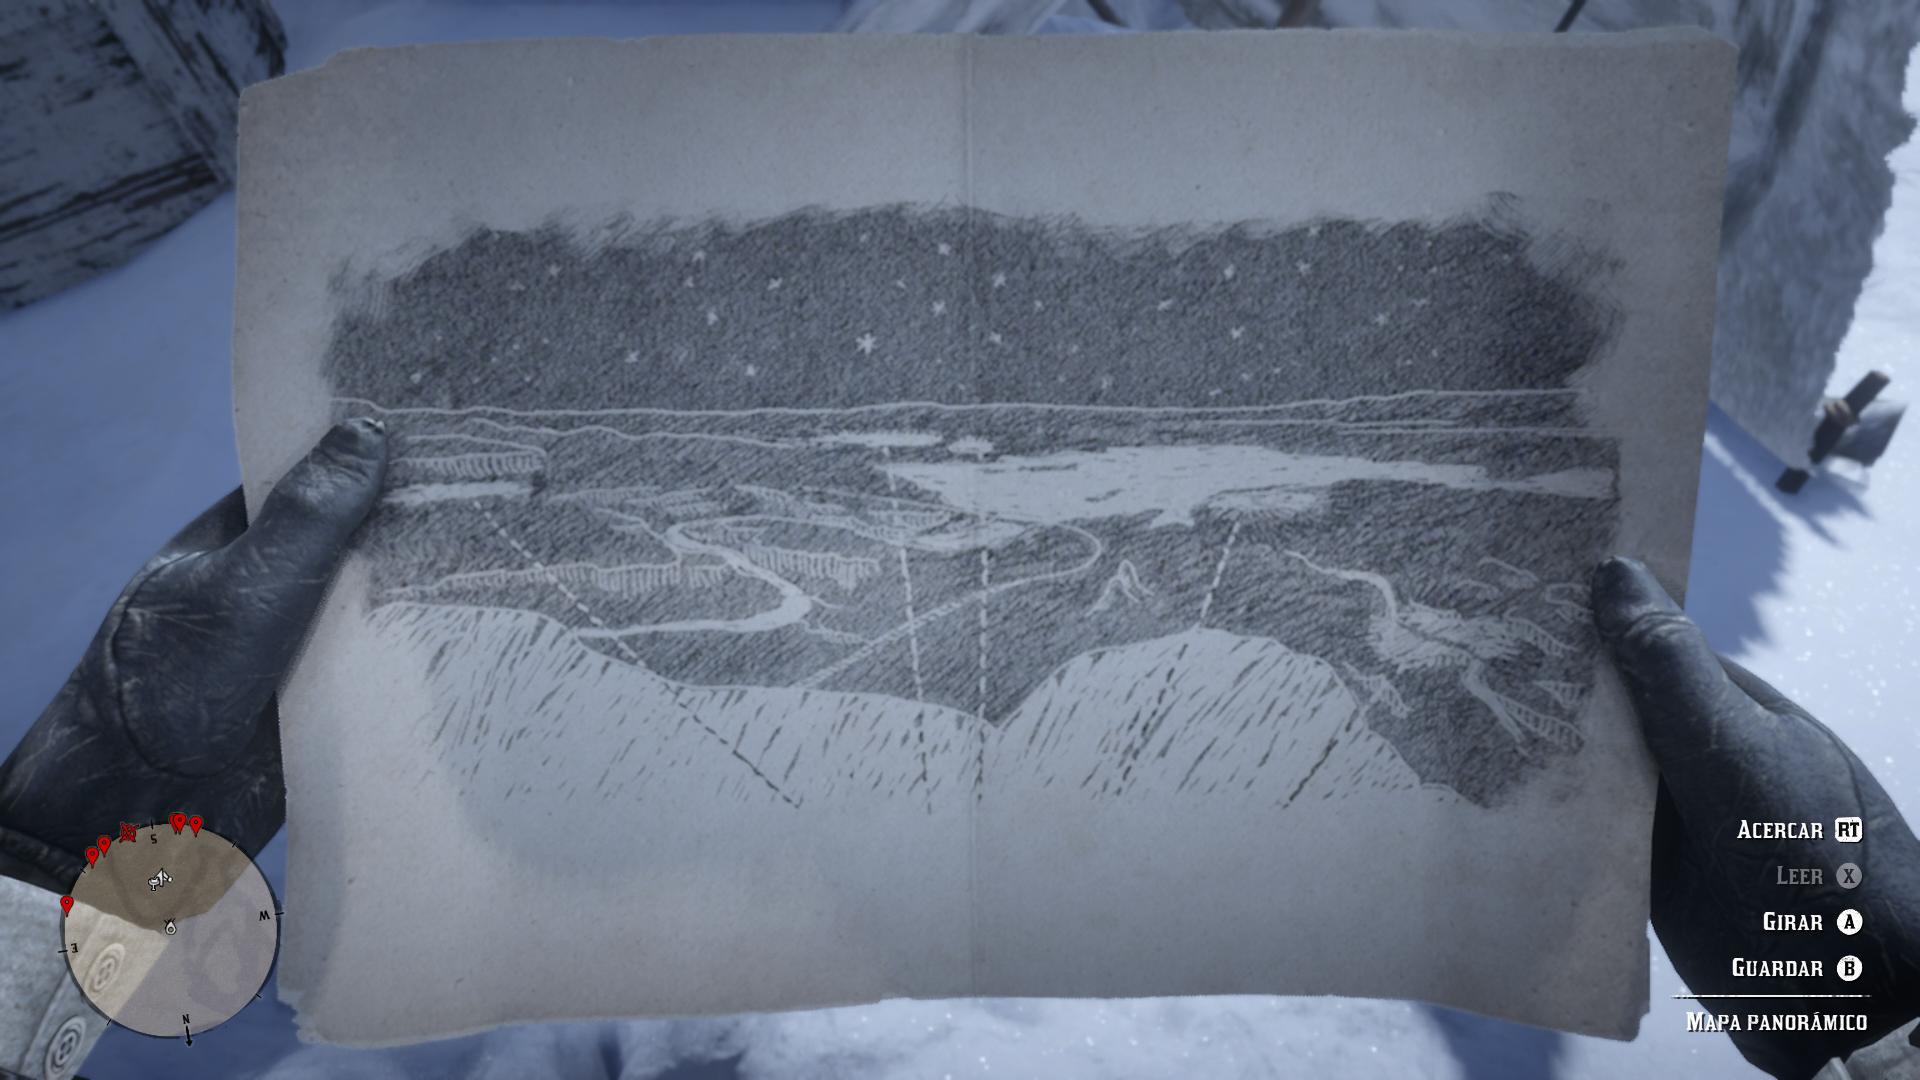 Mapa panorámico